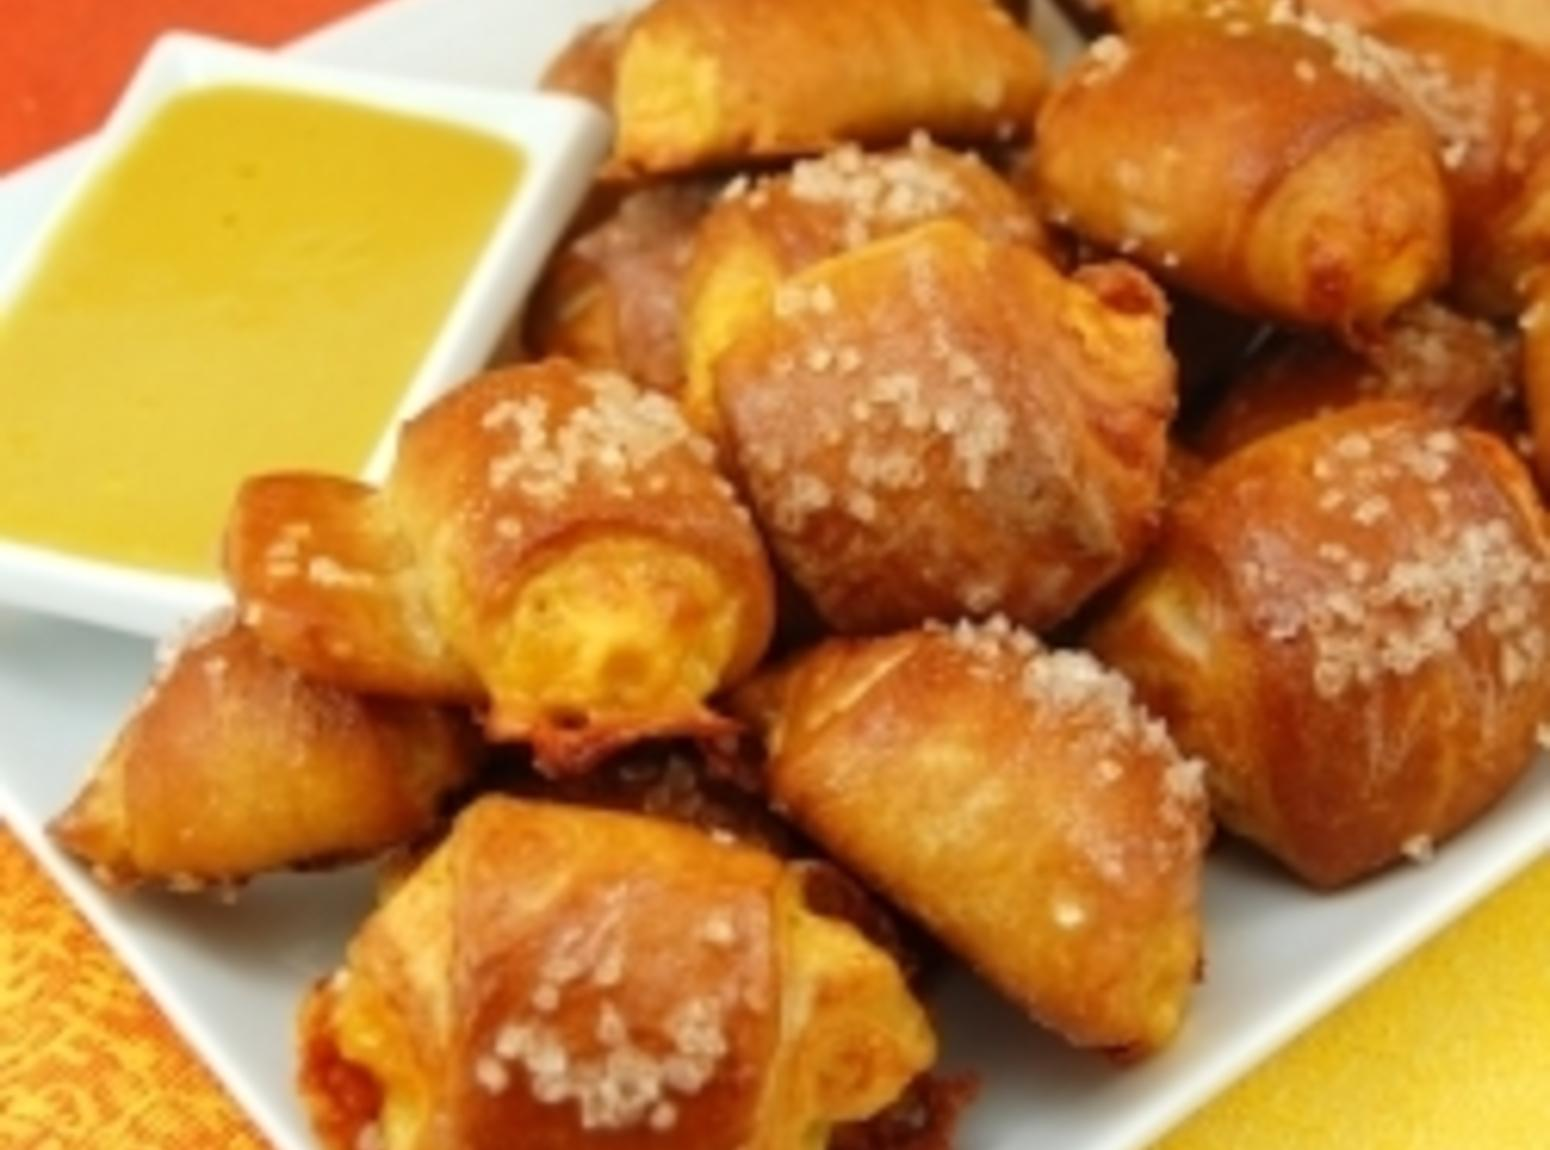 Cheese-Stuffed Pretzel Bites Recipe